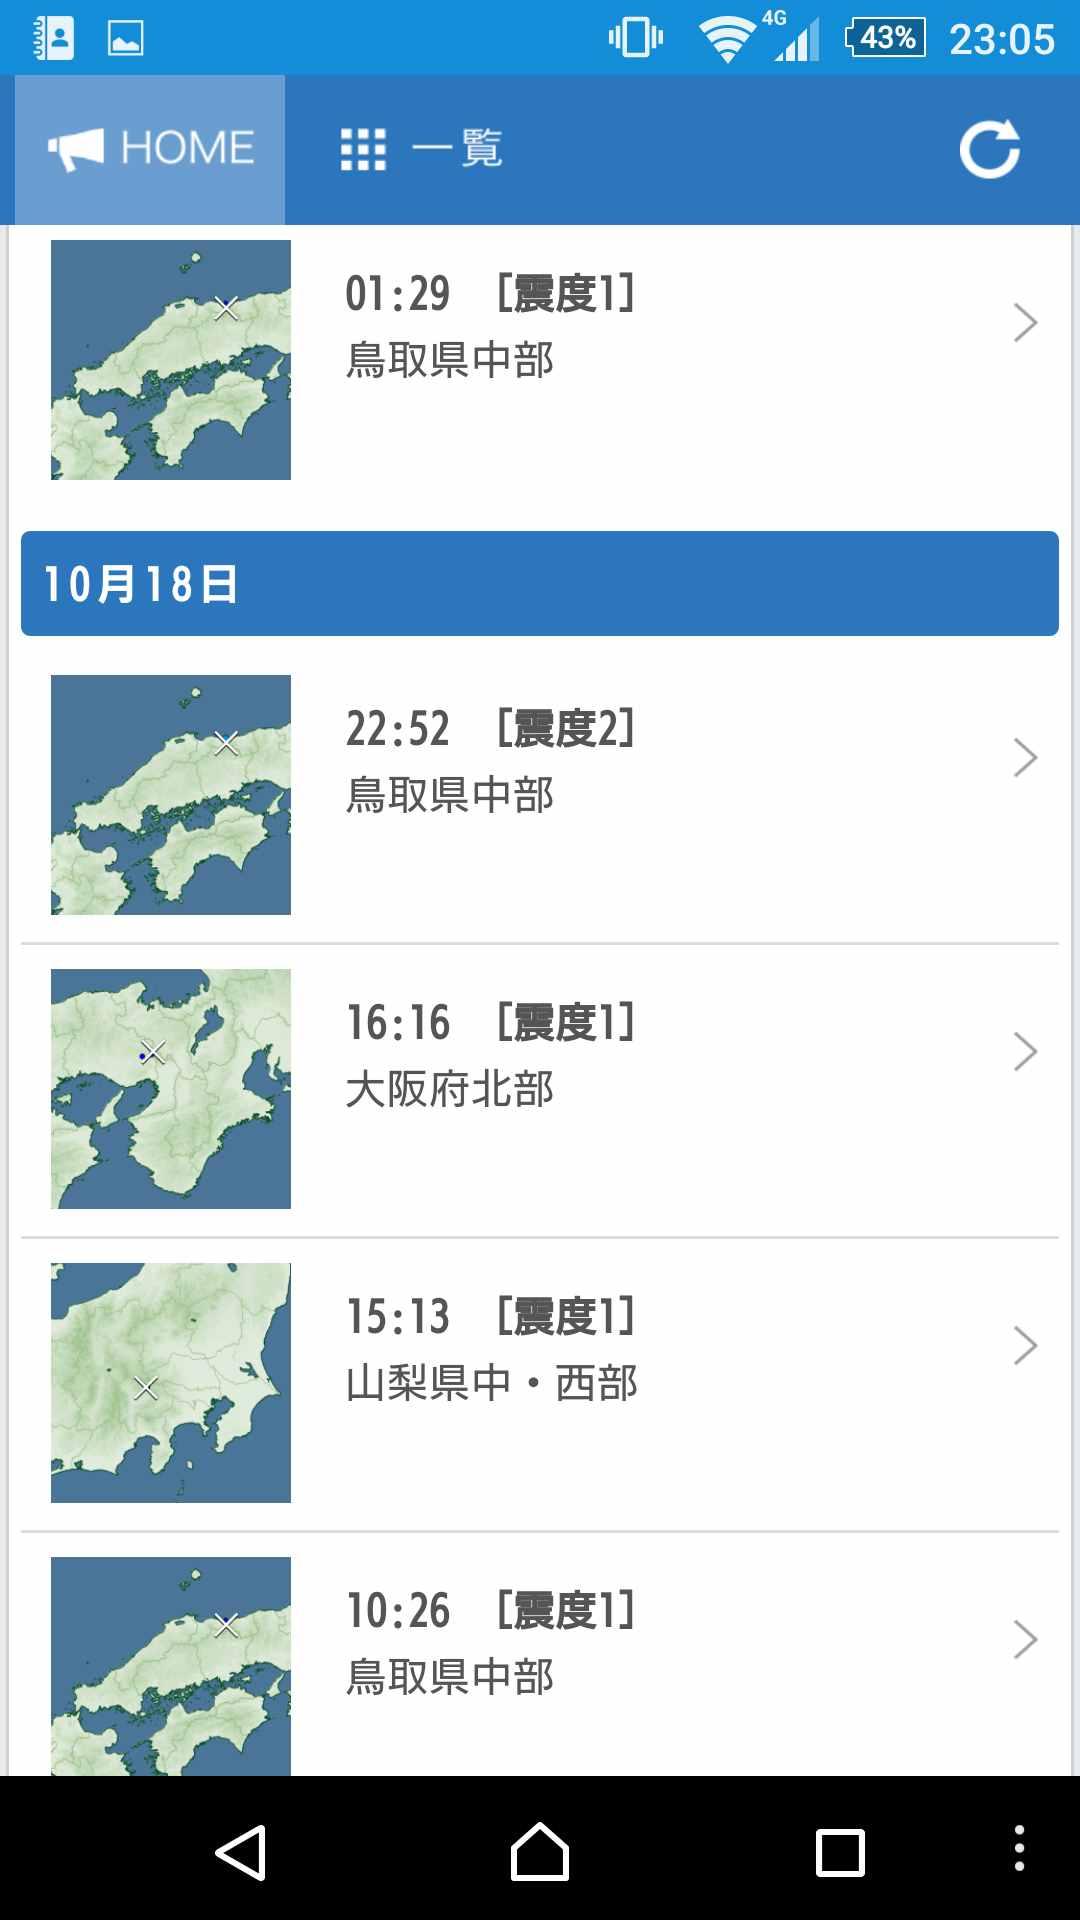 http://blog-imgs-81.fc2.com/o/k/a/okarutojishinyogen/news4vip_1445263860_102.jpg